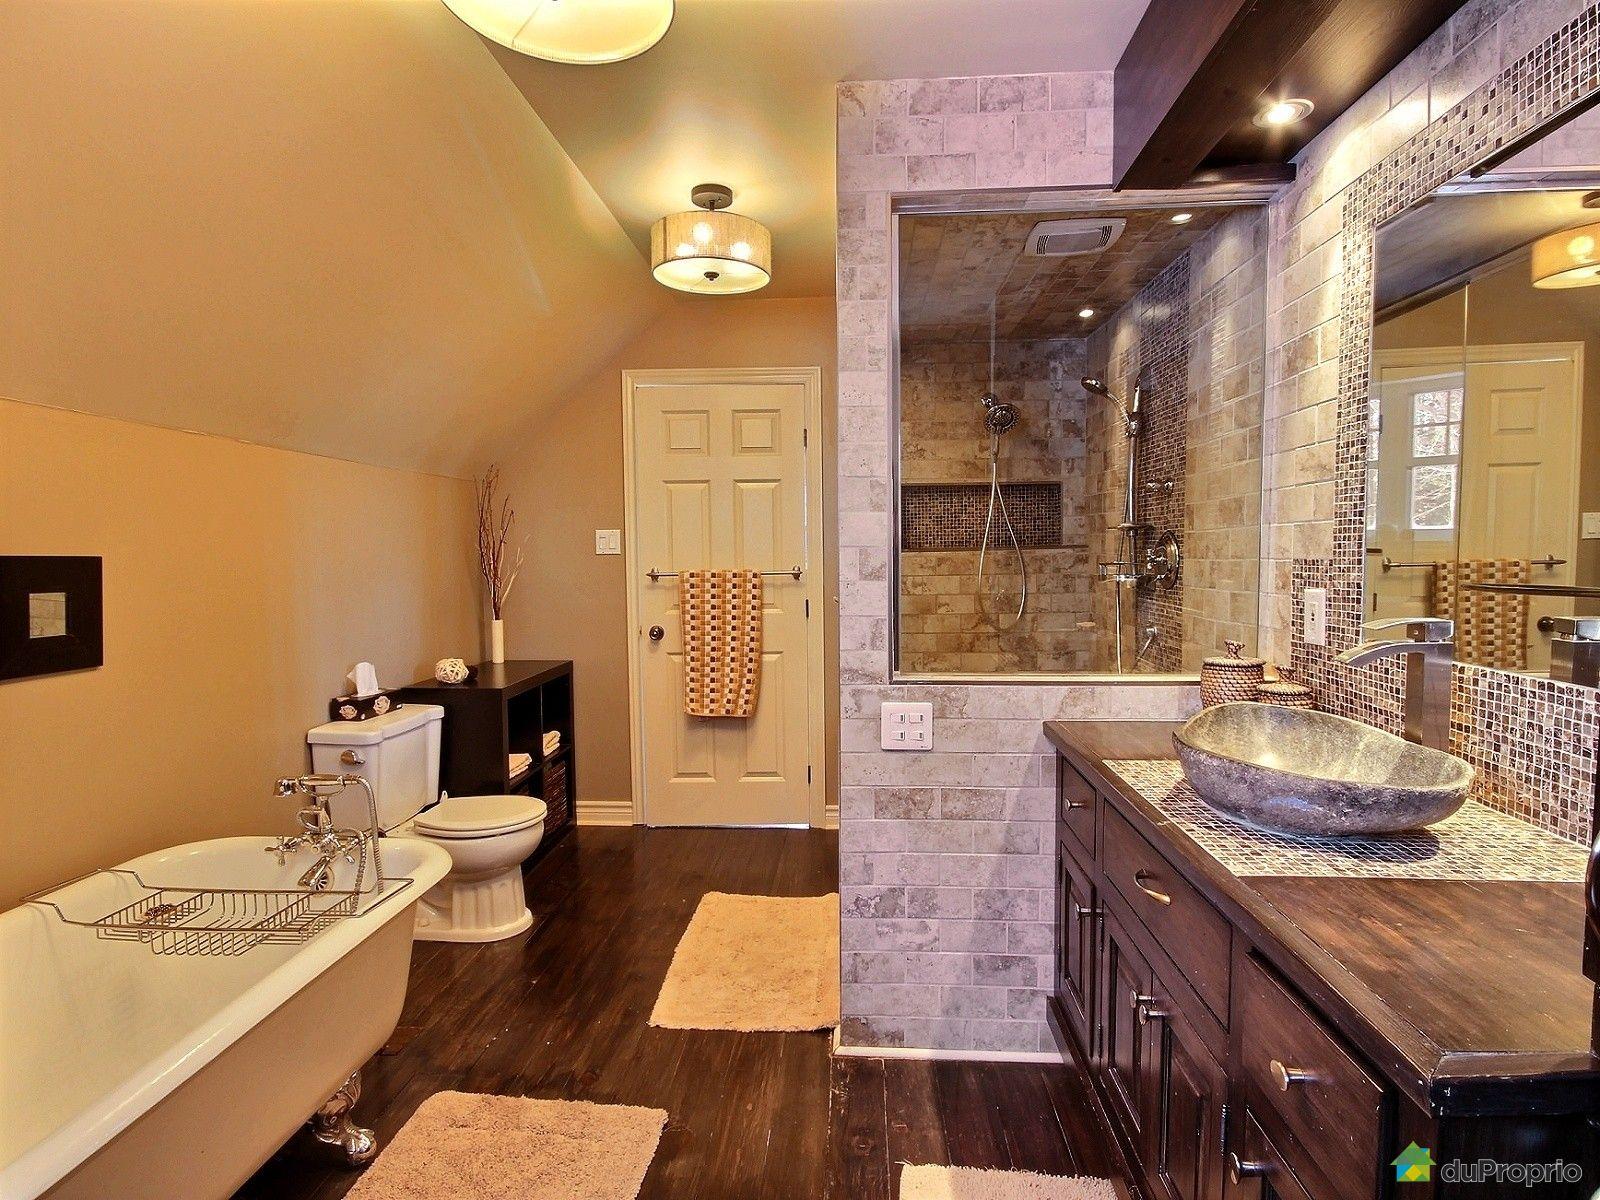 maison vendre mascouche 1450 avenue du mistral immobilier qu bec duproprio 679423. Black Bedroom Furniture Sets. Home Design Ideas